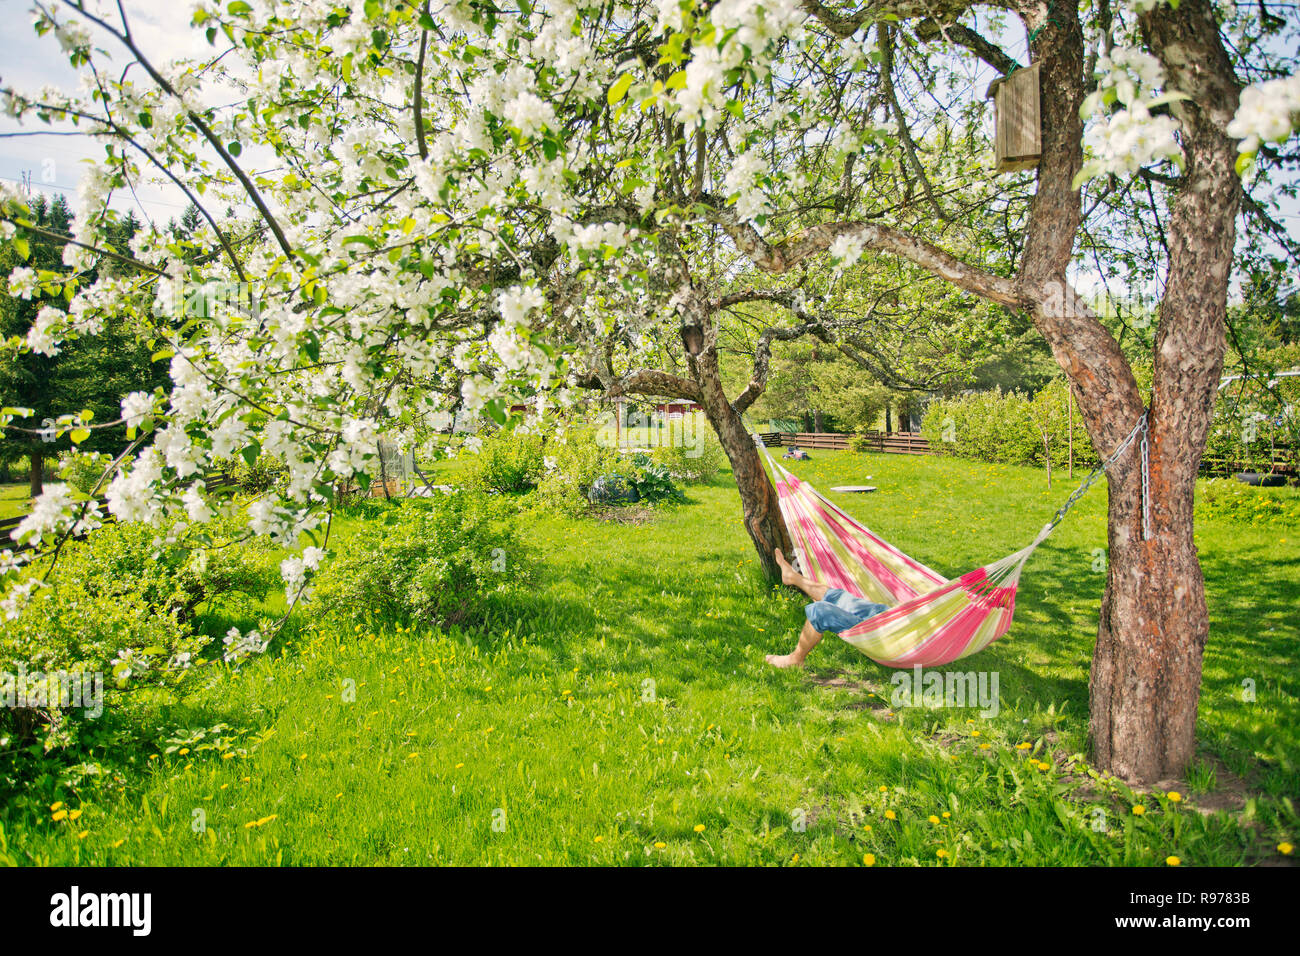 Mid adult man resting on hammock in Heinola, Finland - Stock Image